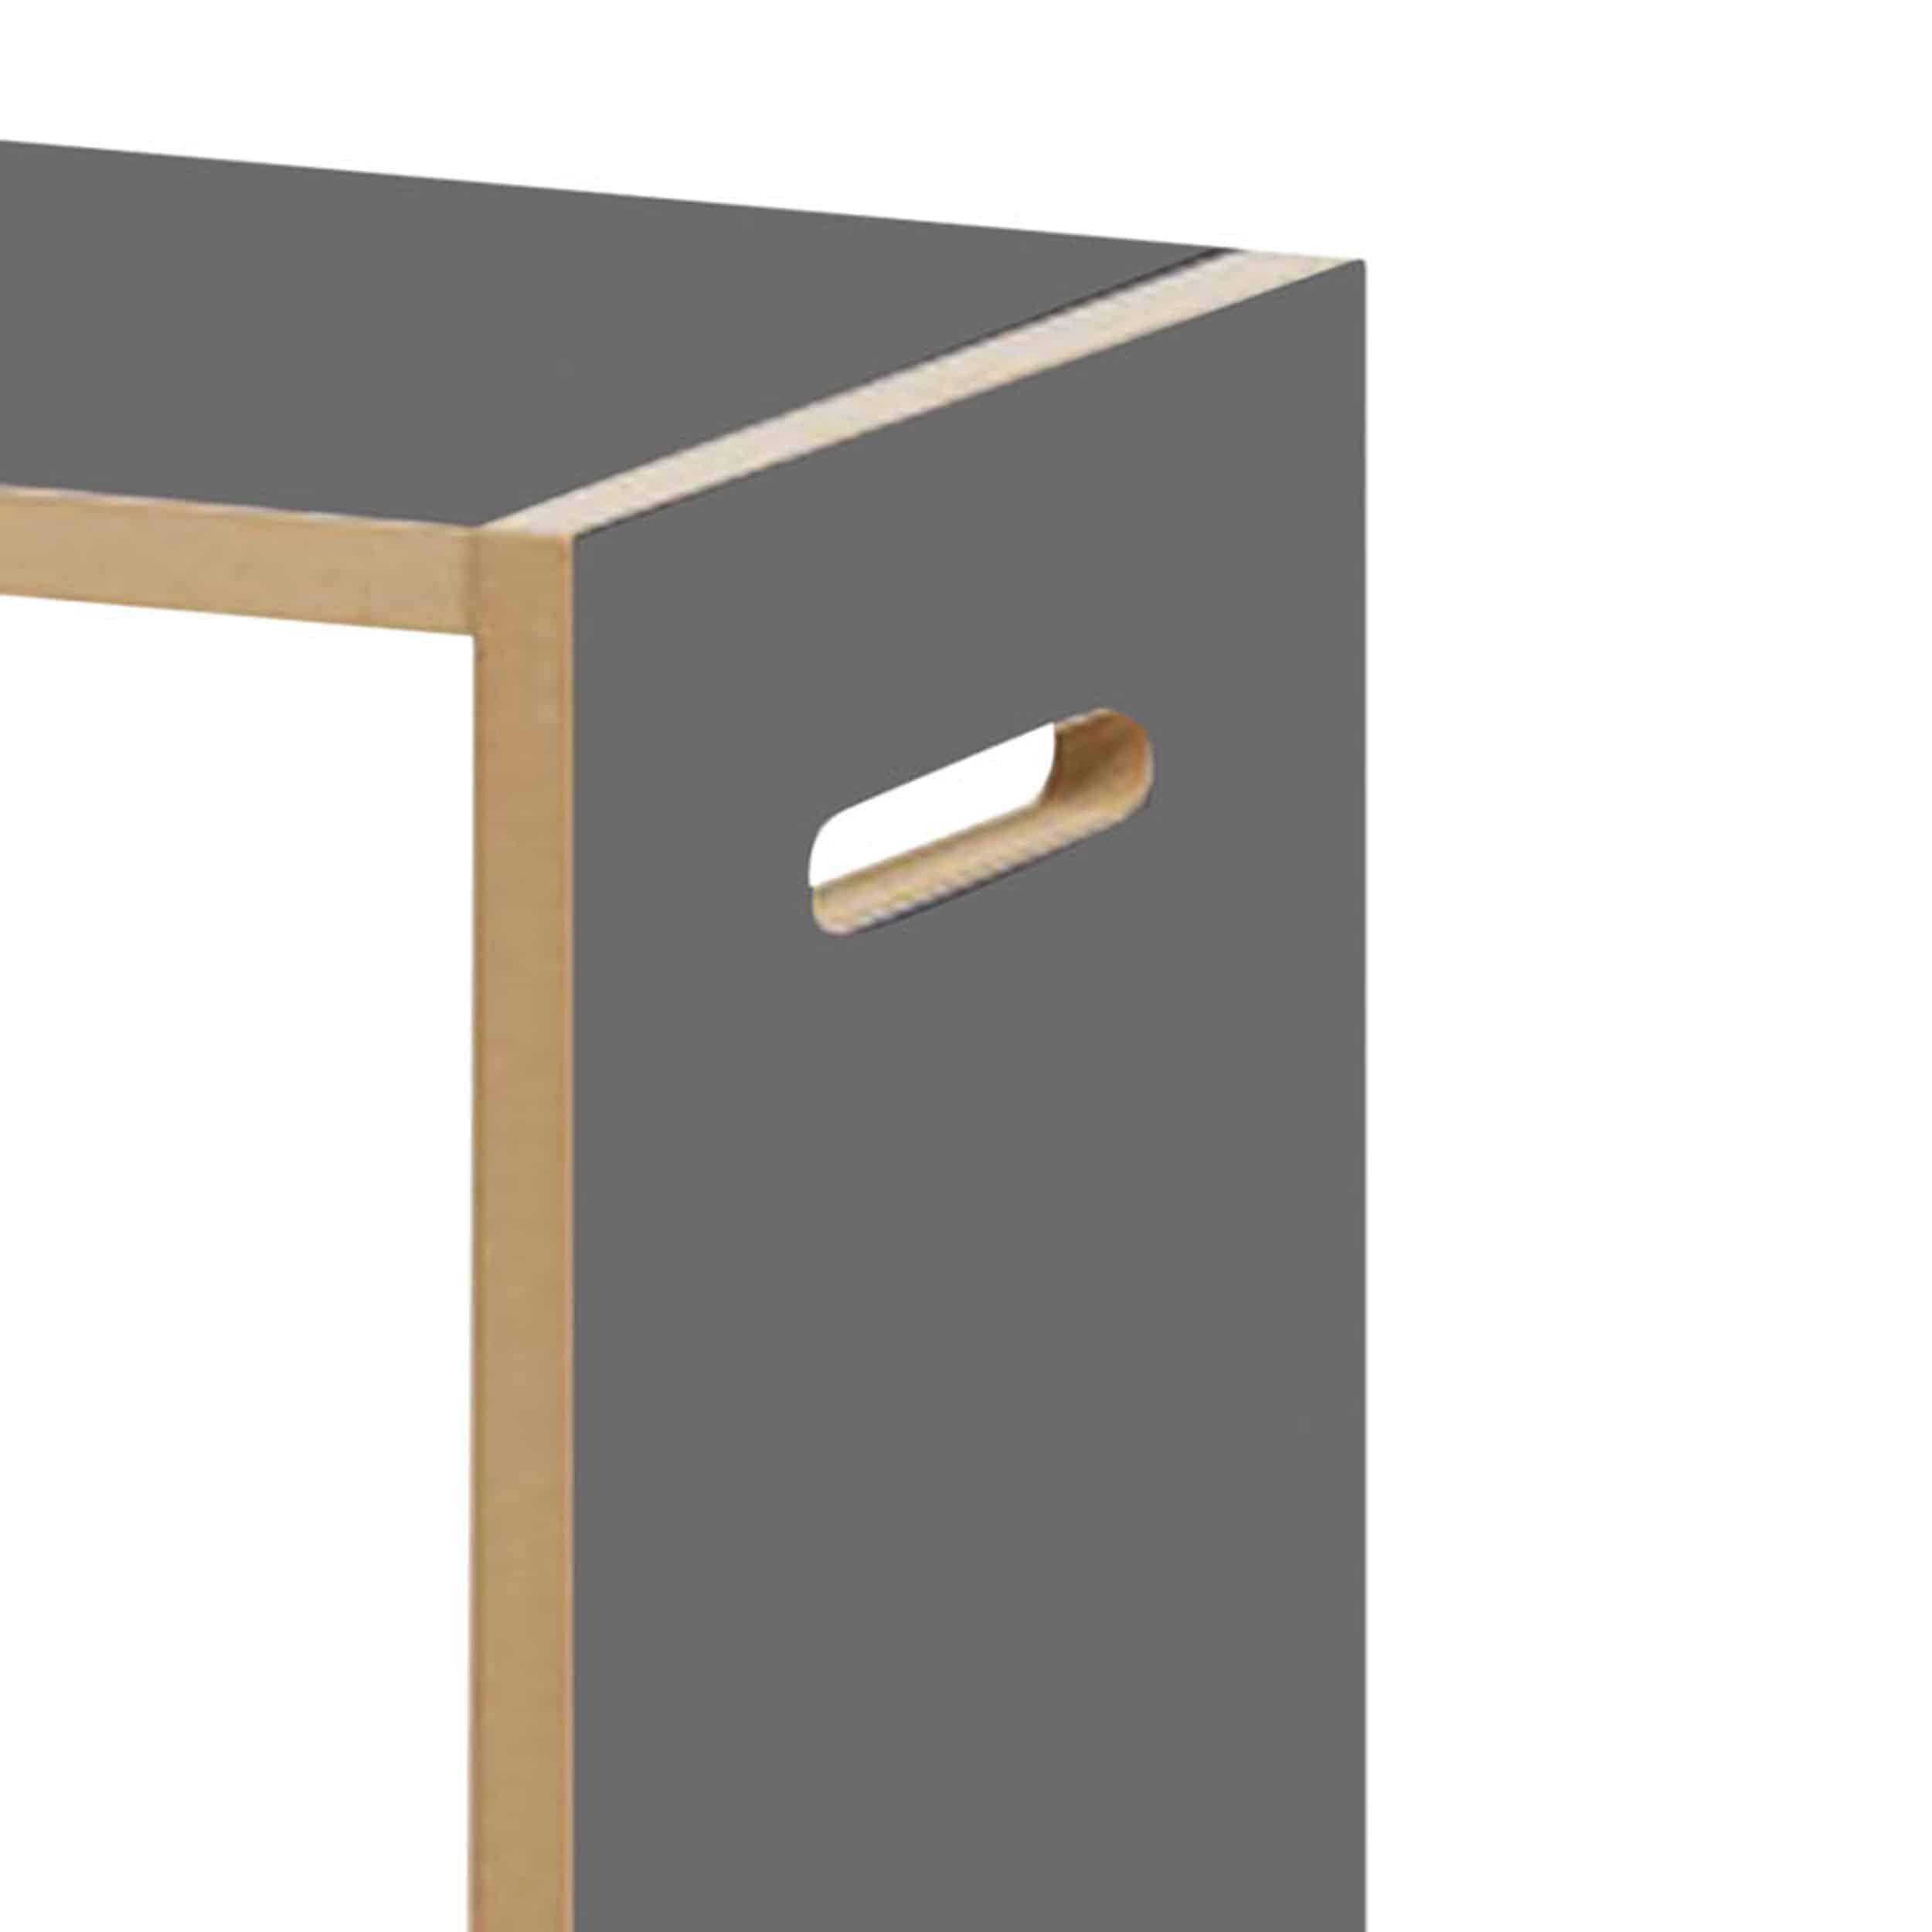 Tojo-hochstapler Grundelement mit Türen